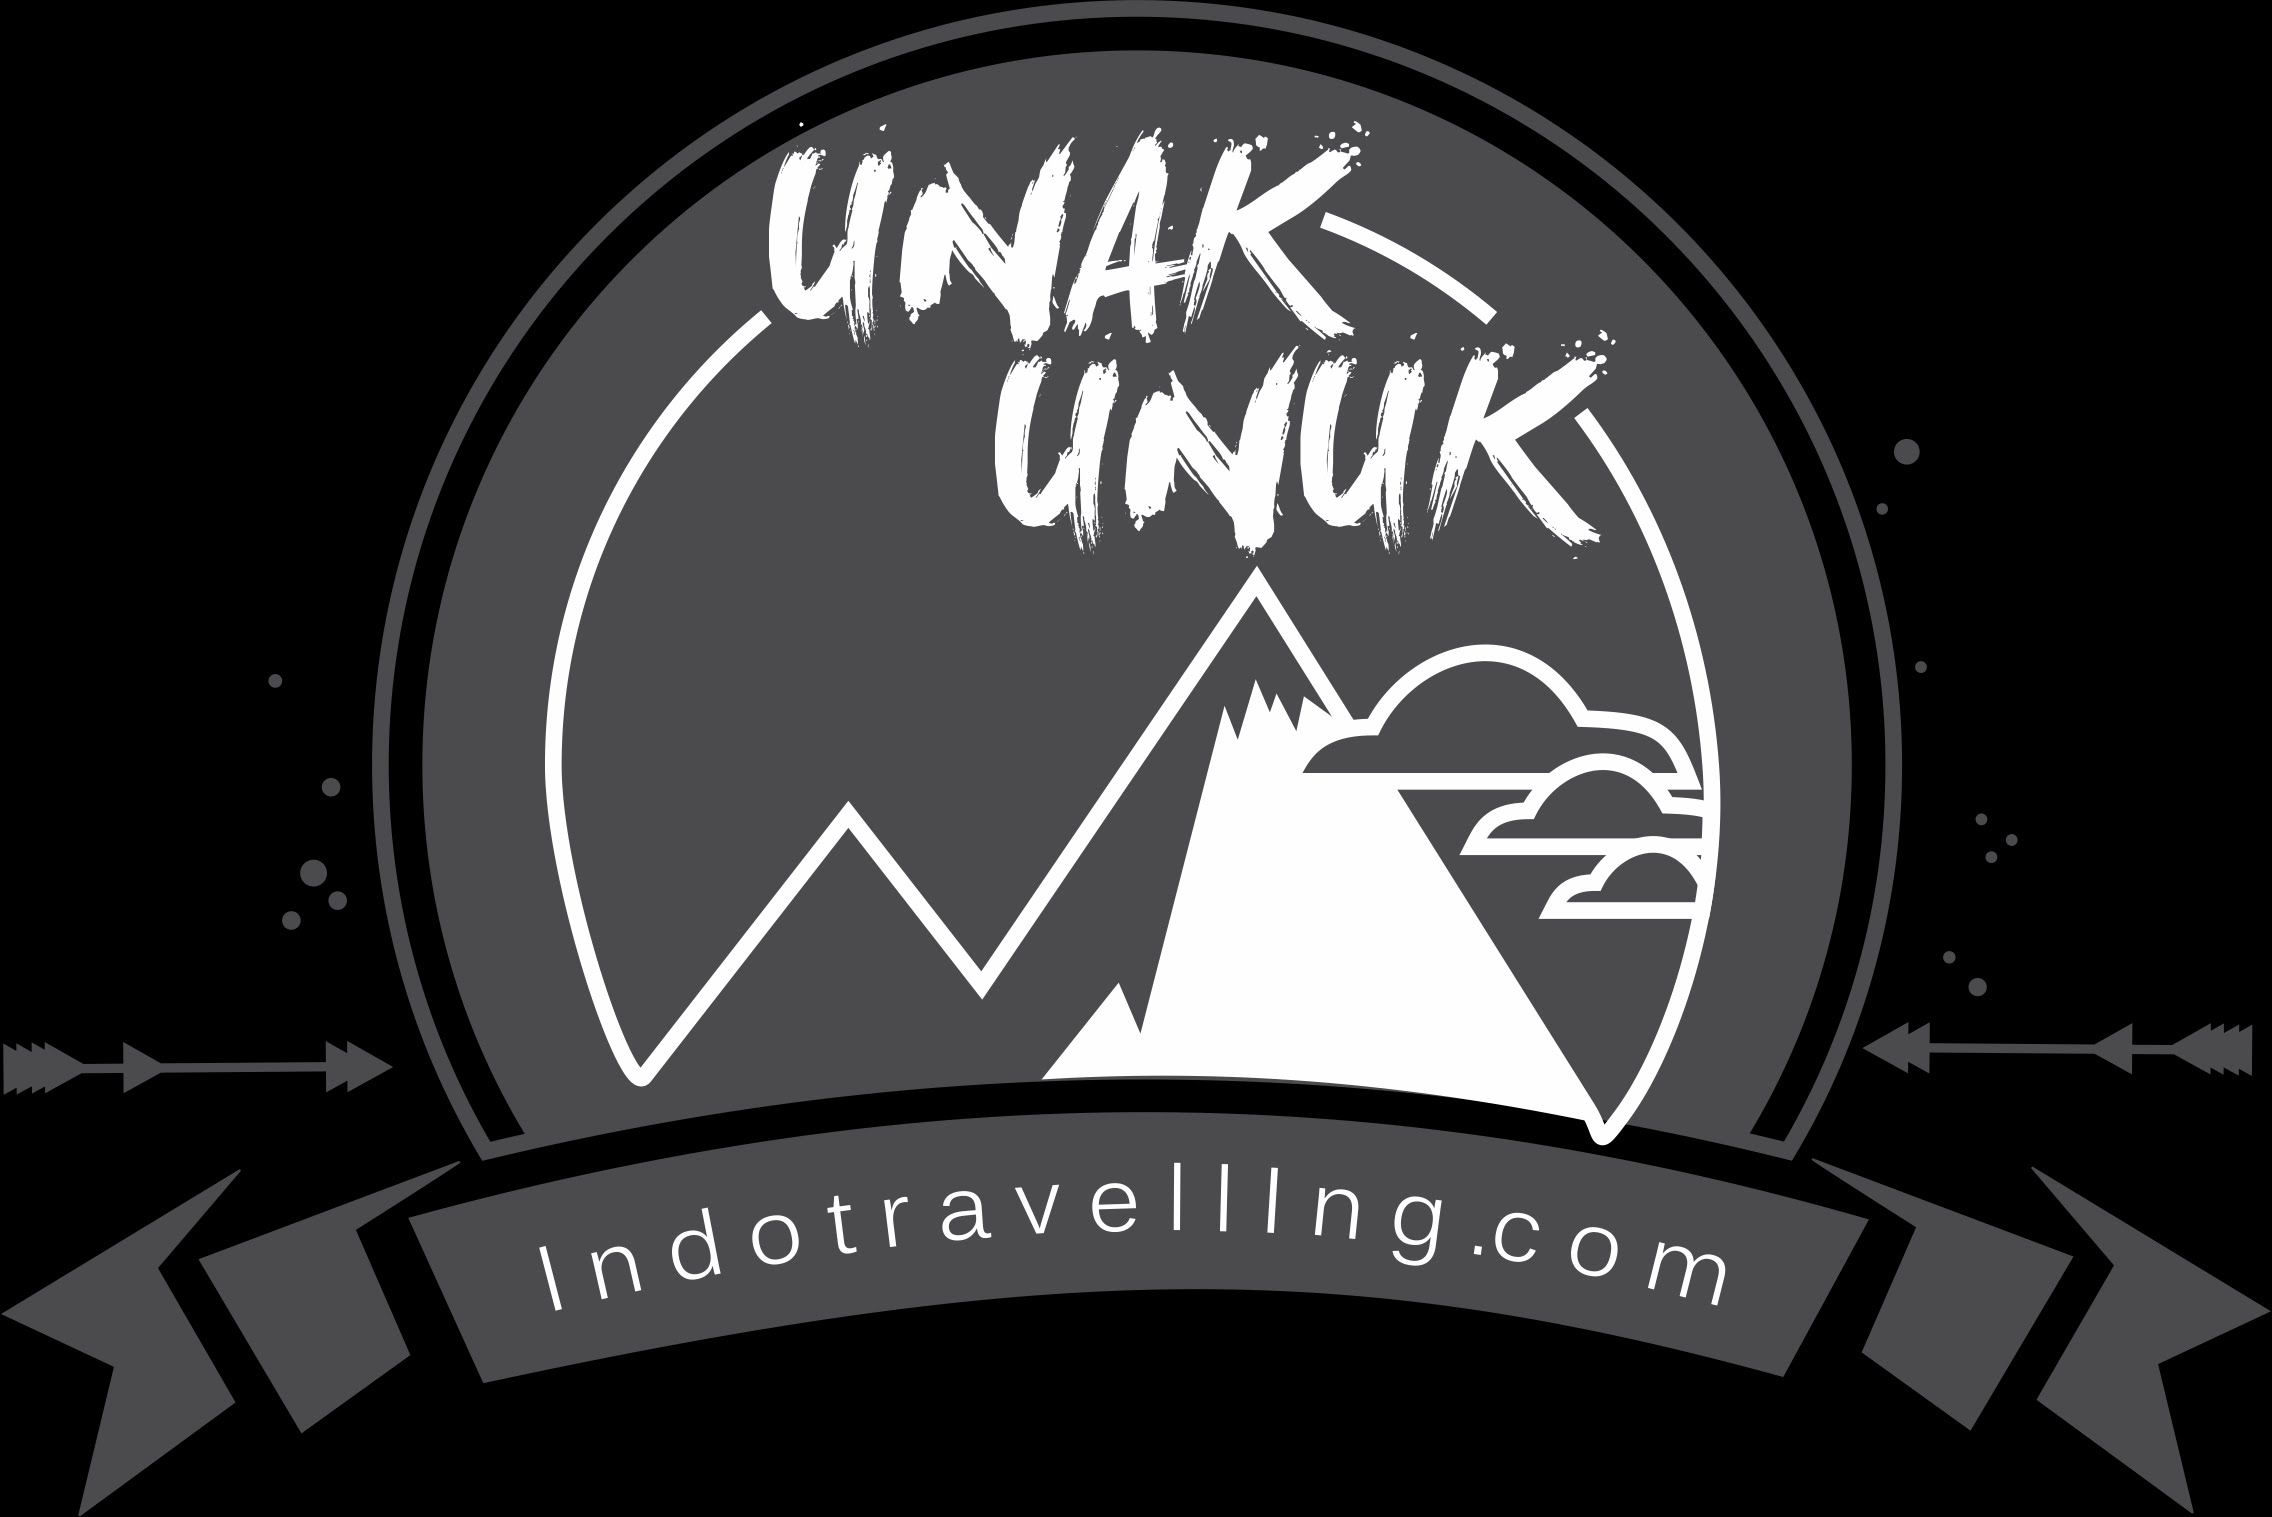 Tutorial Coreldraw X7 For Beginners Simple Travelling Logo Design